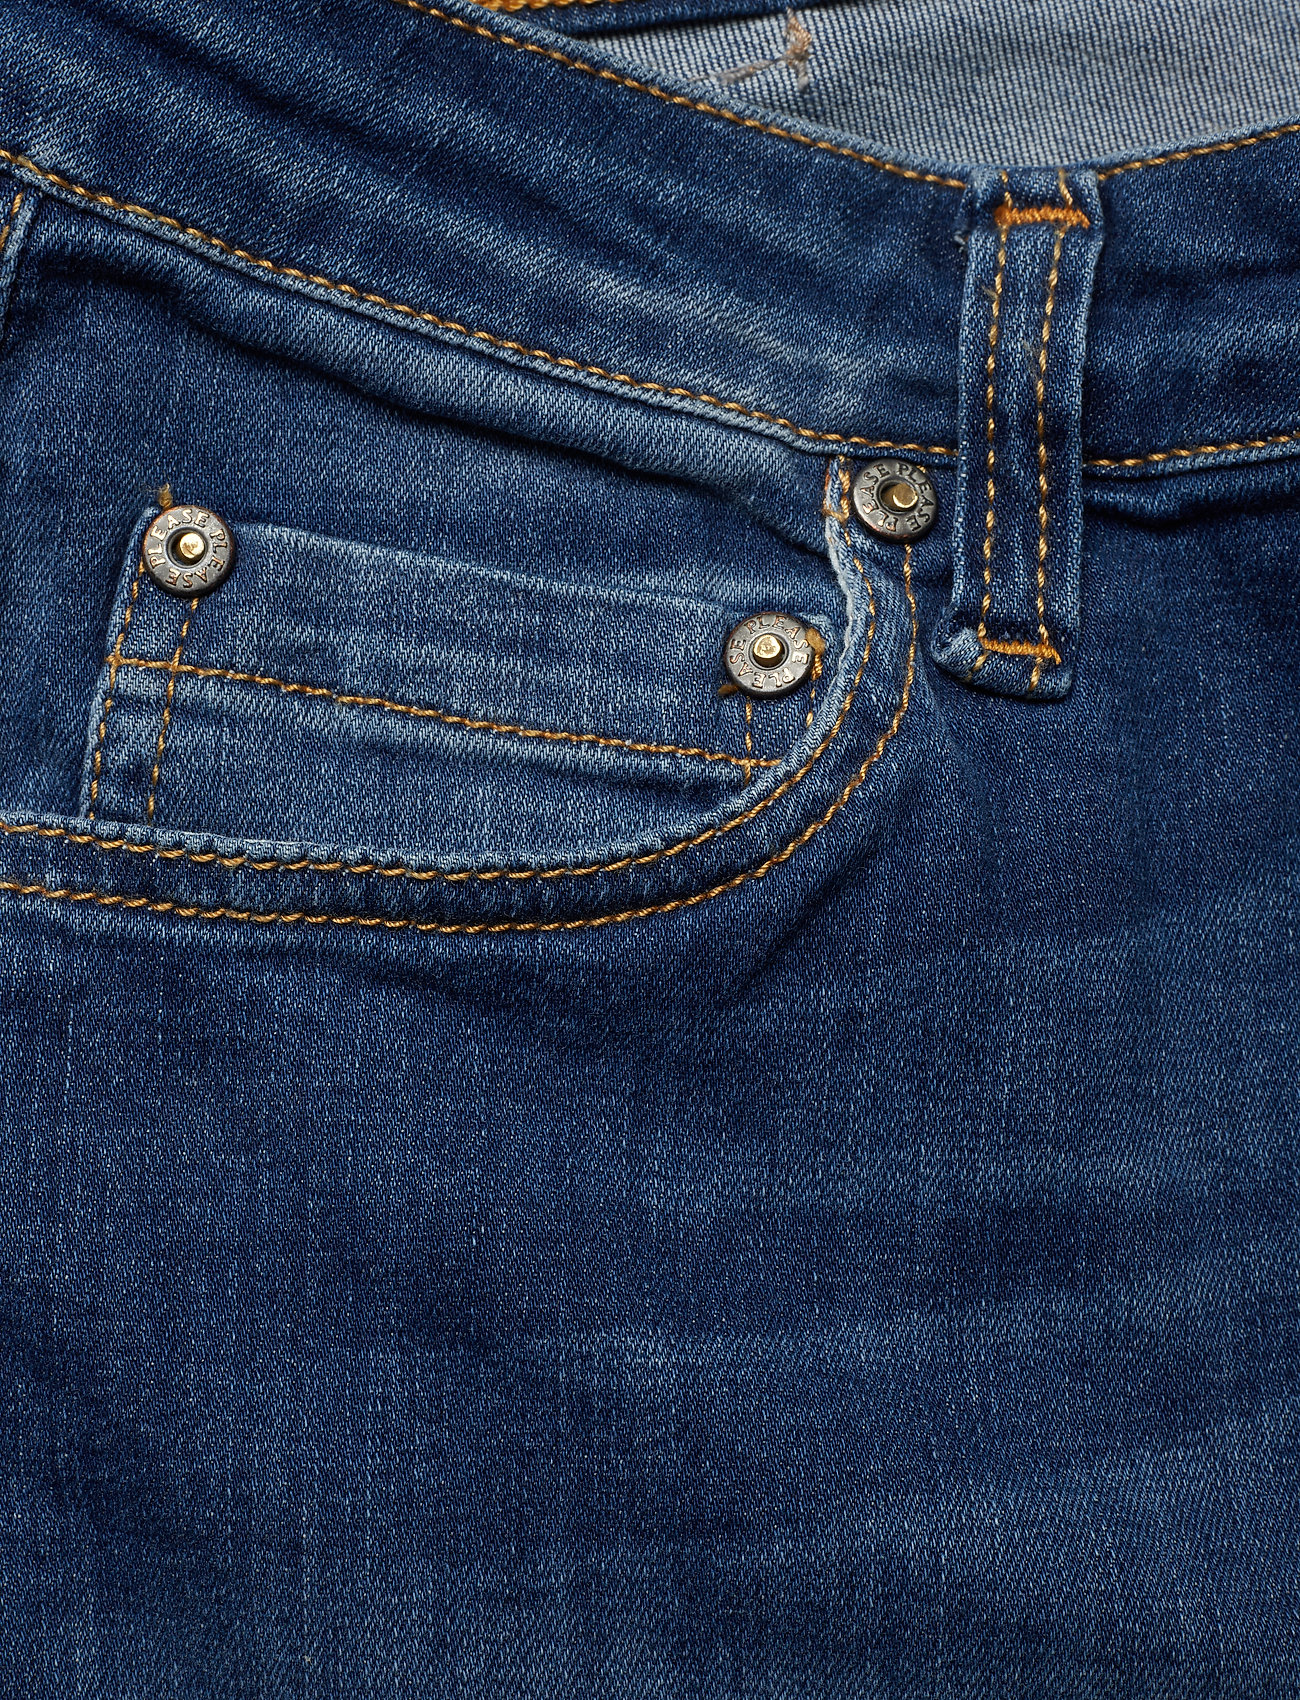 Blue Longcut Berlin Jeans  Please  Jeans - Dameklær er billig